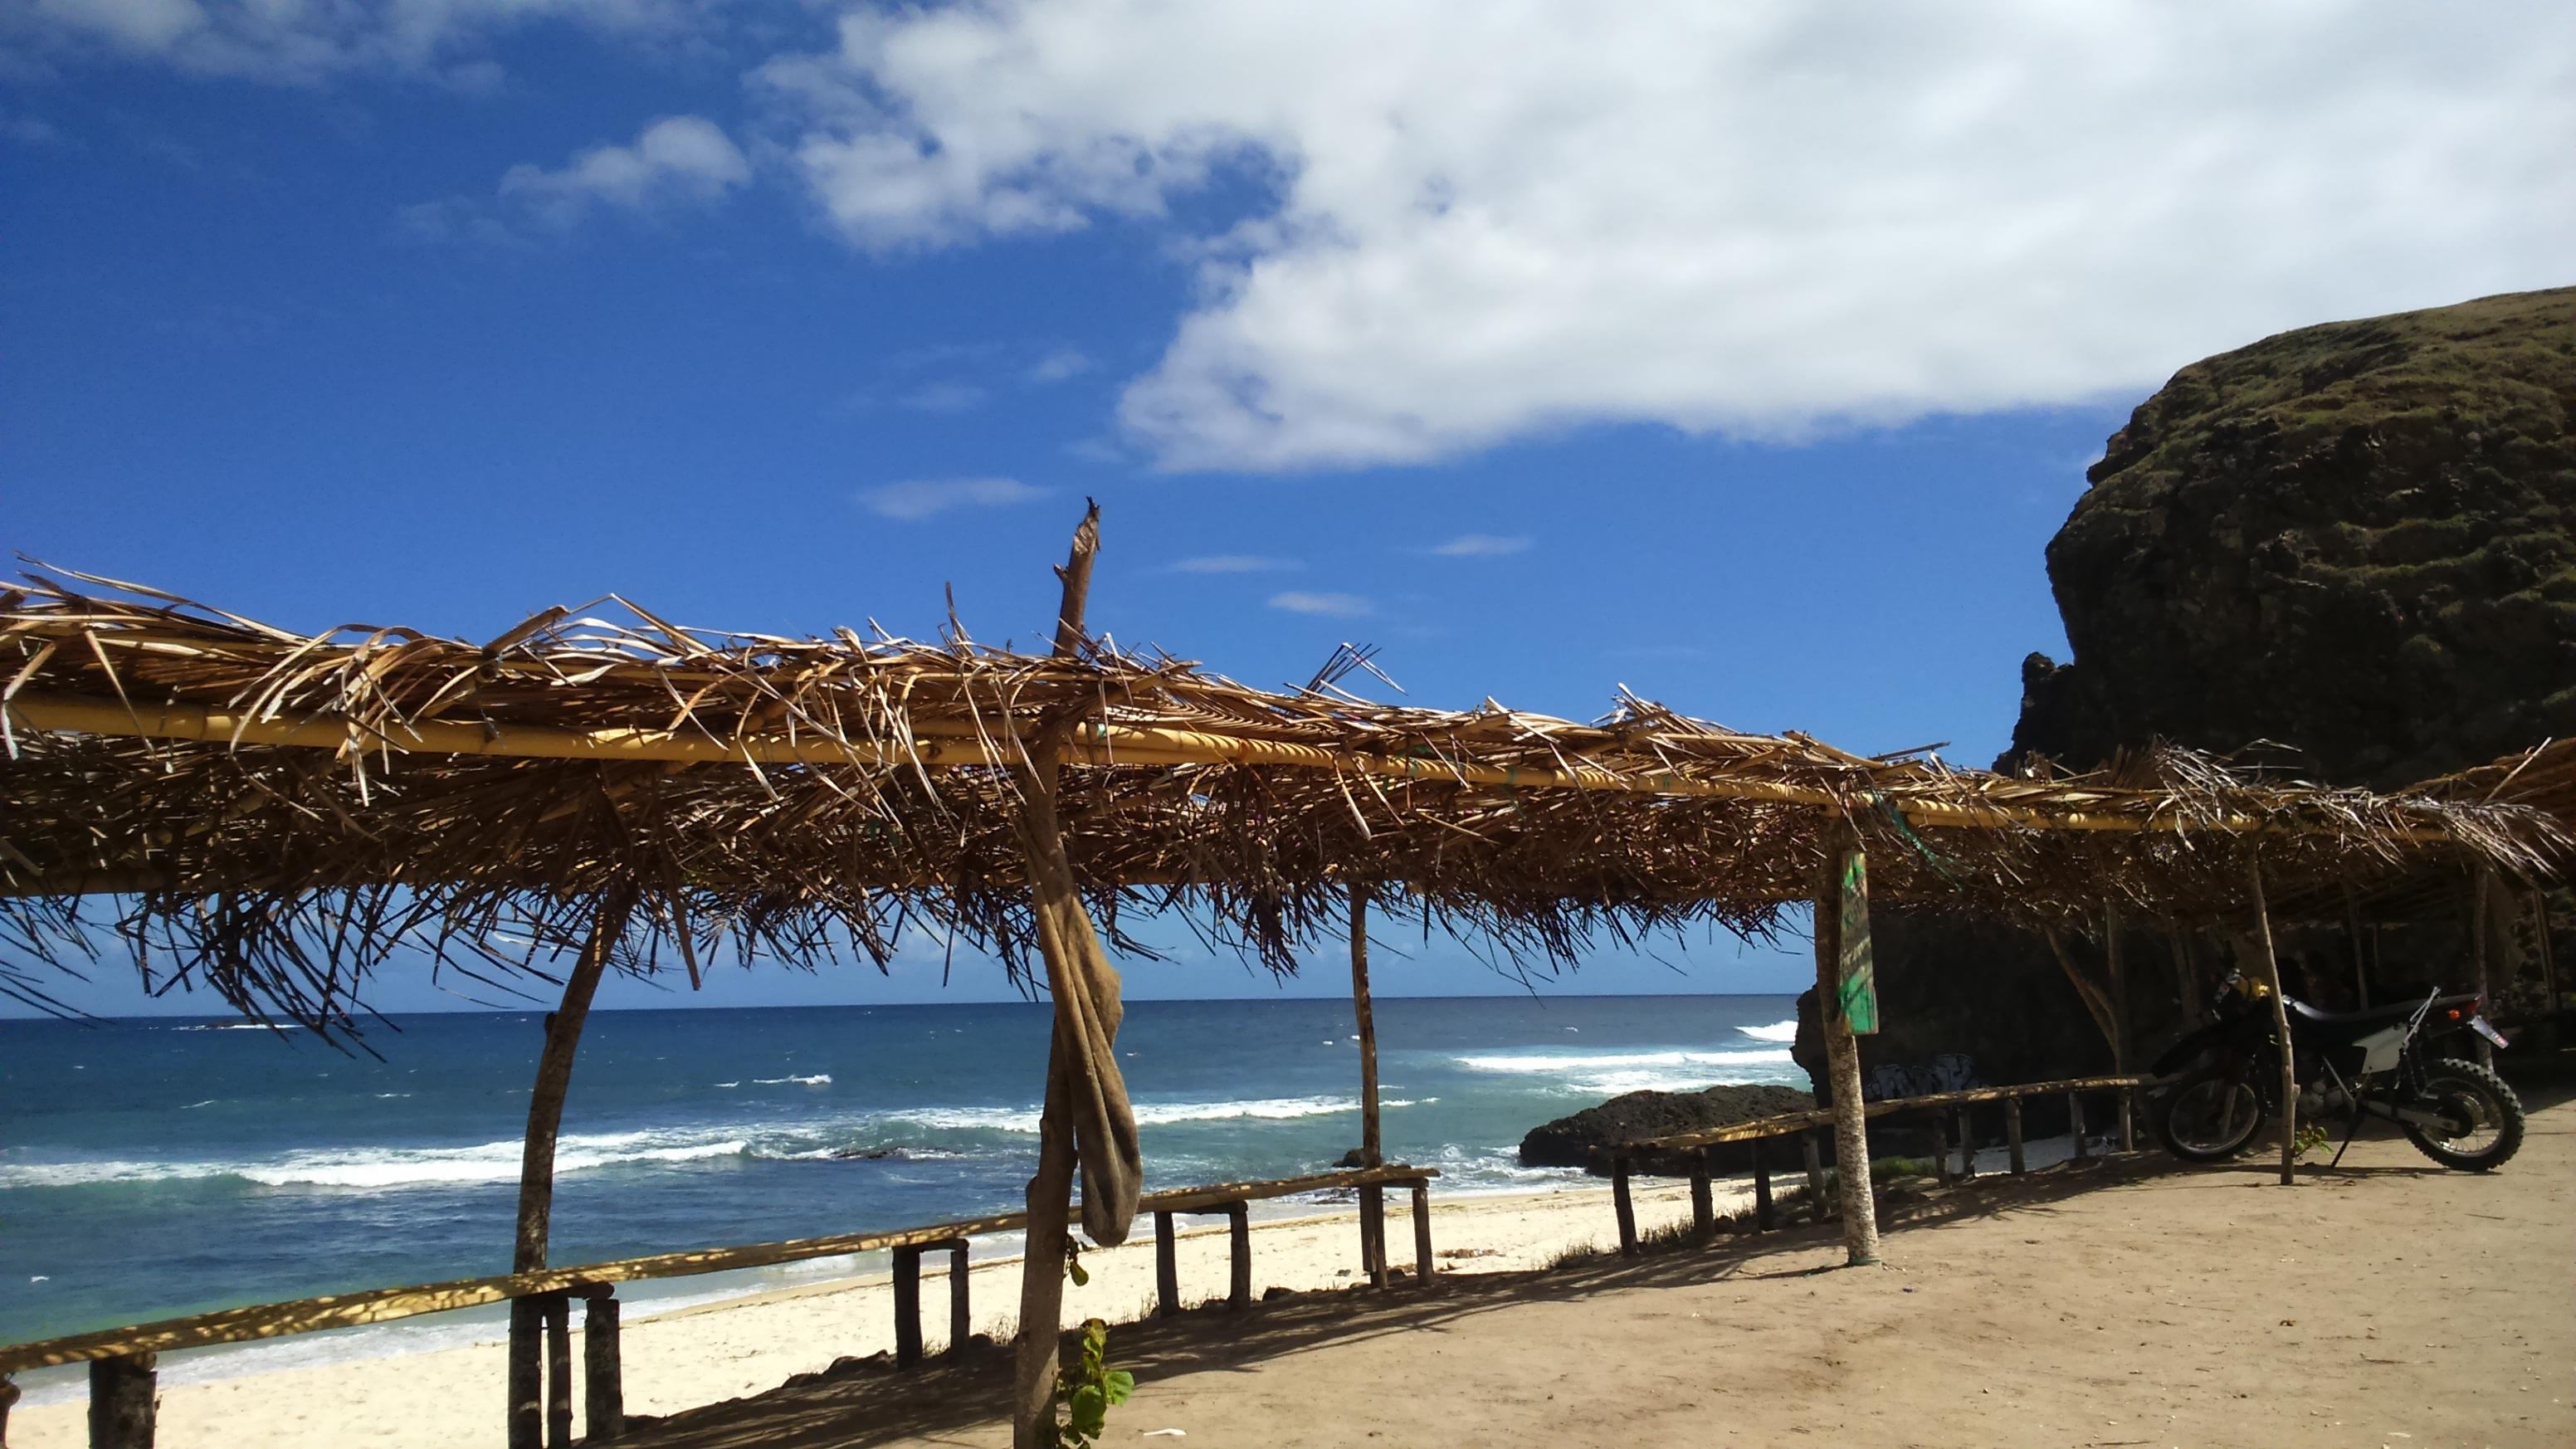 Jejeran bangku di pinggir pantai